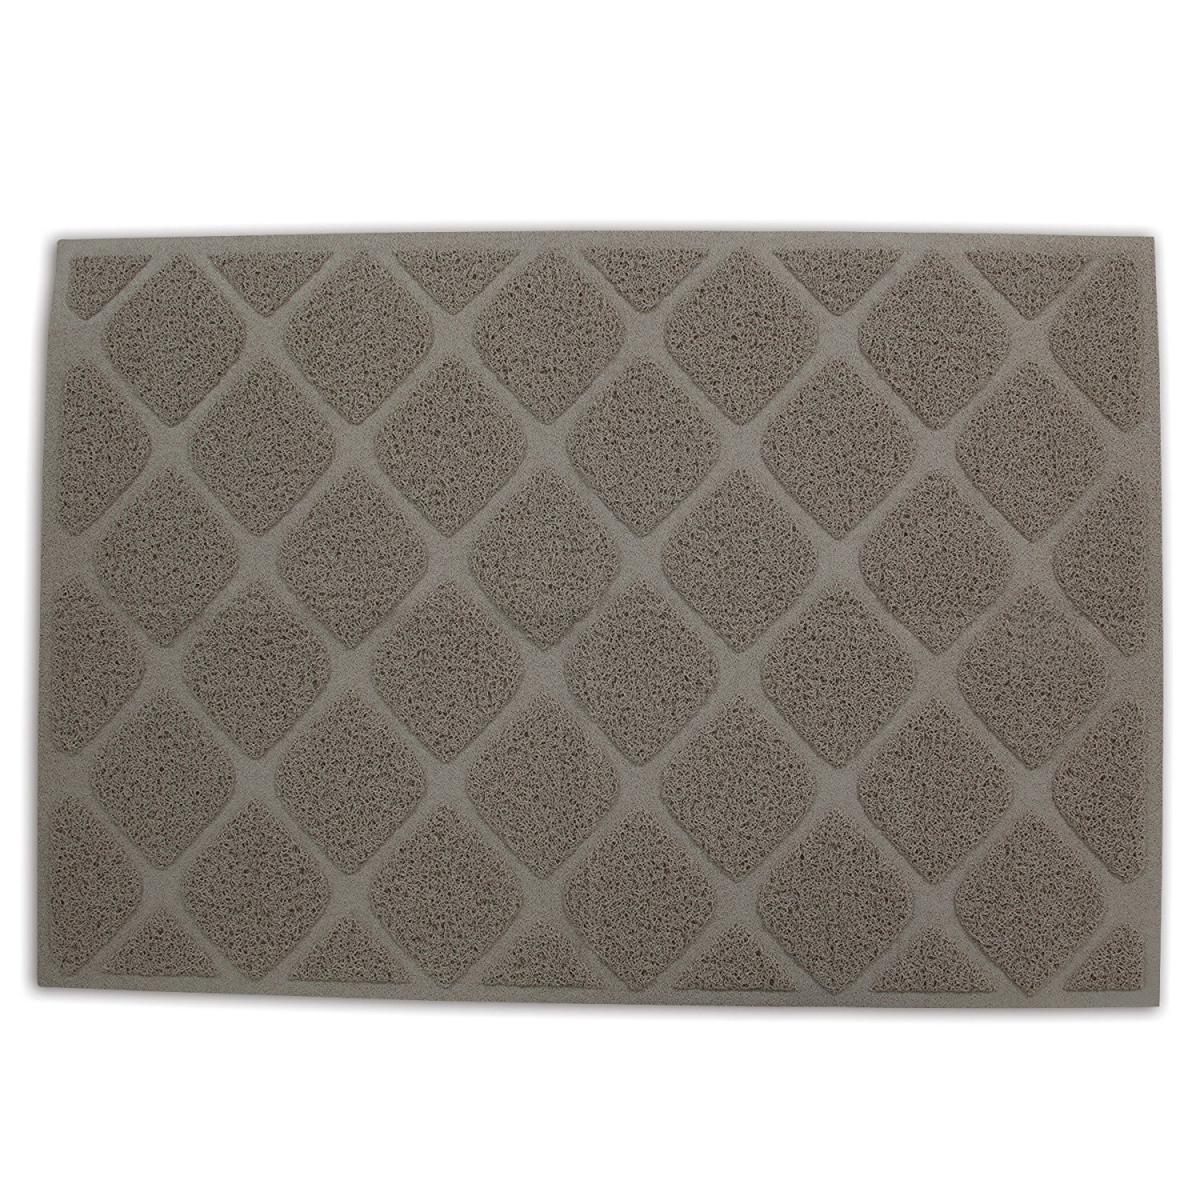 Petmate Litter Mat, Grid Design, Stone, 47 x 32 x 0.2 inches